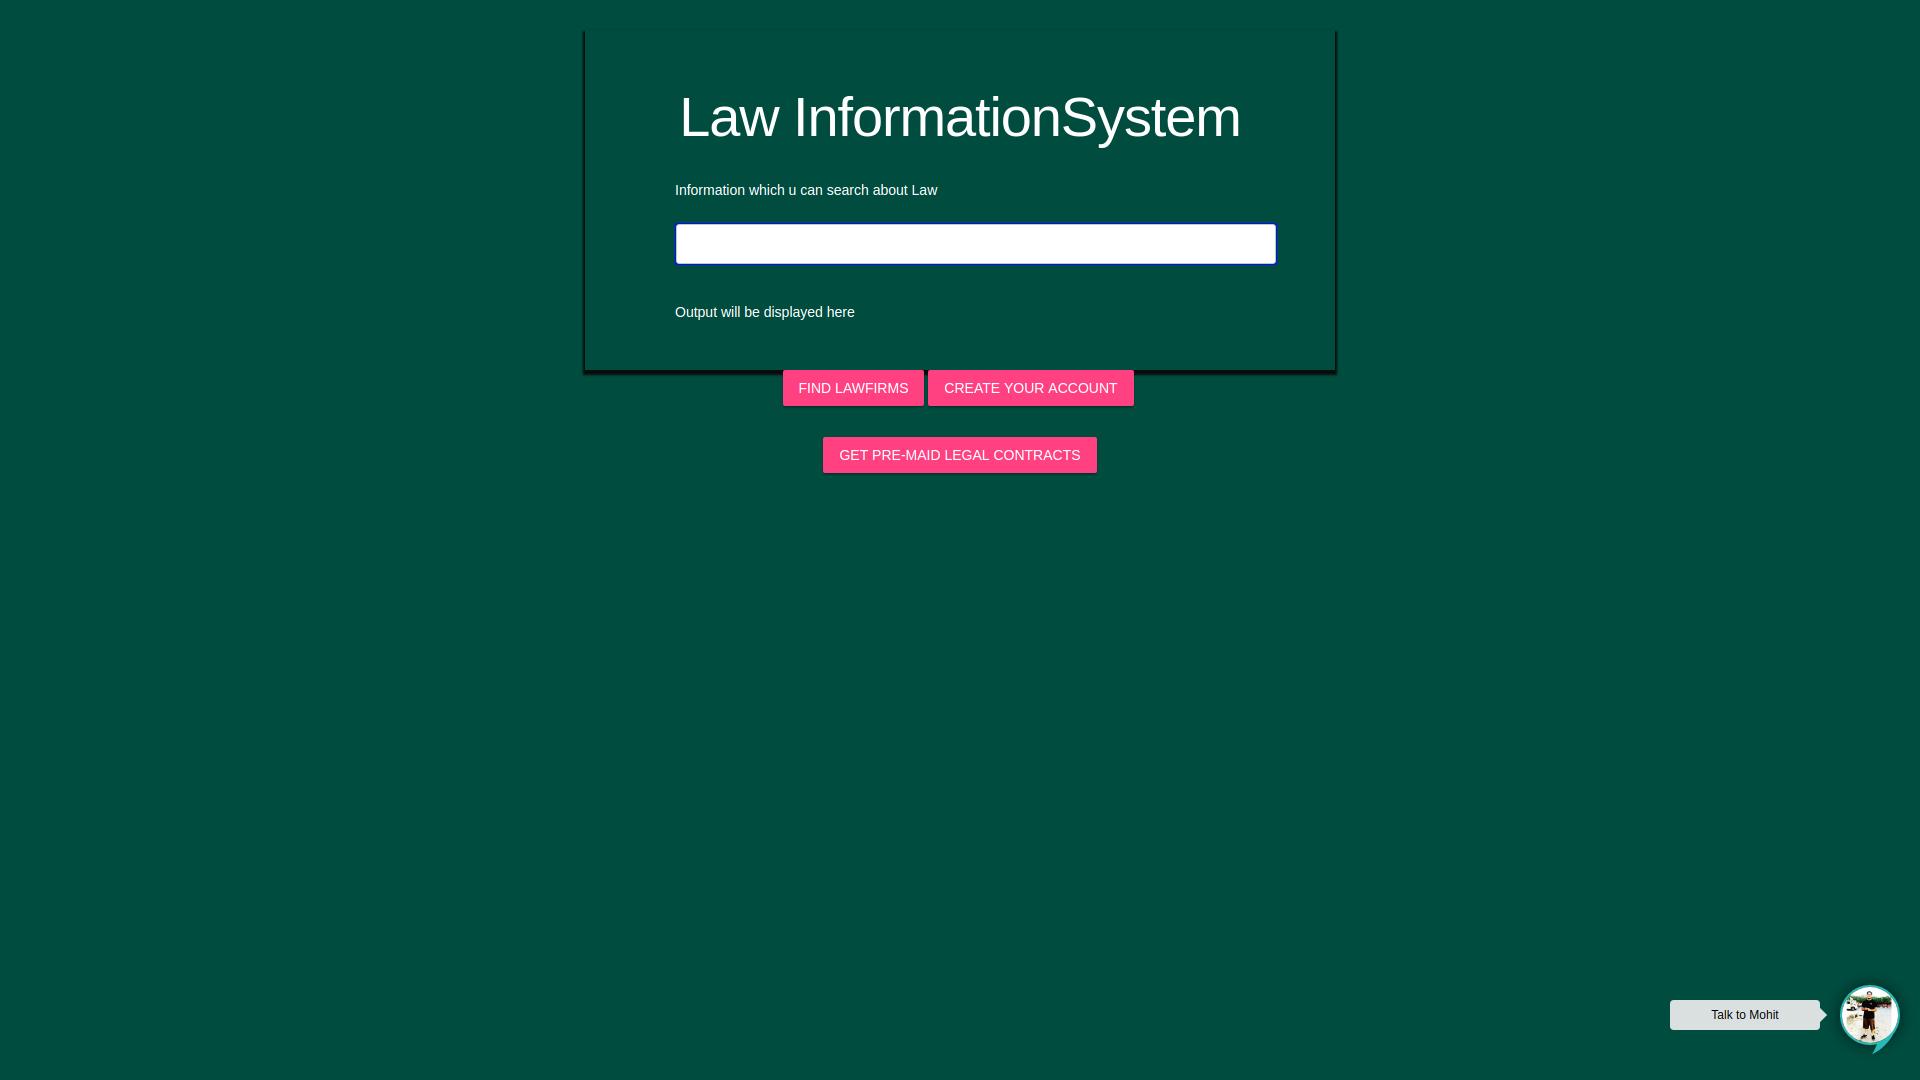 Law_infosystem